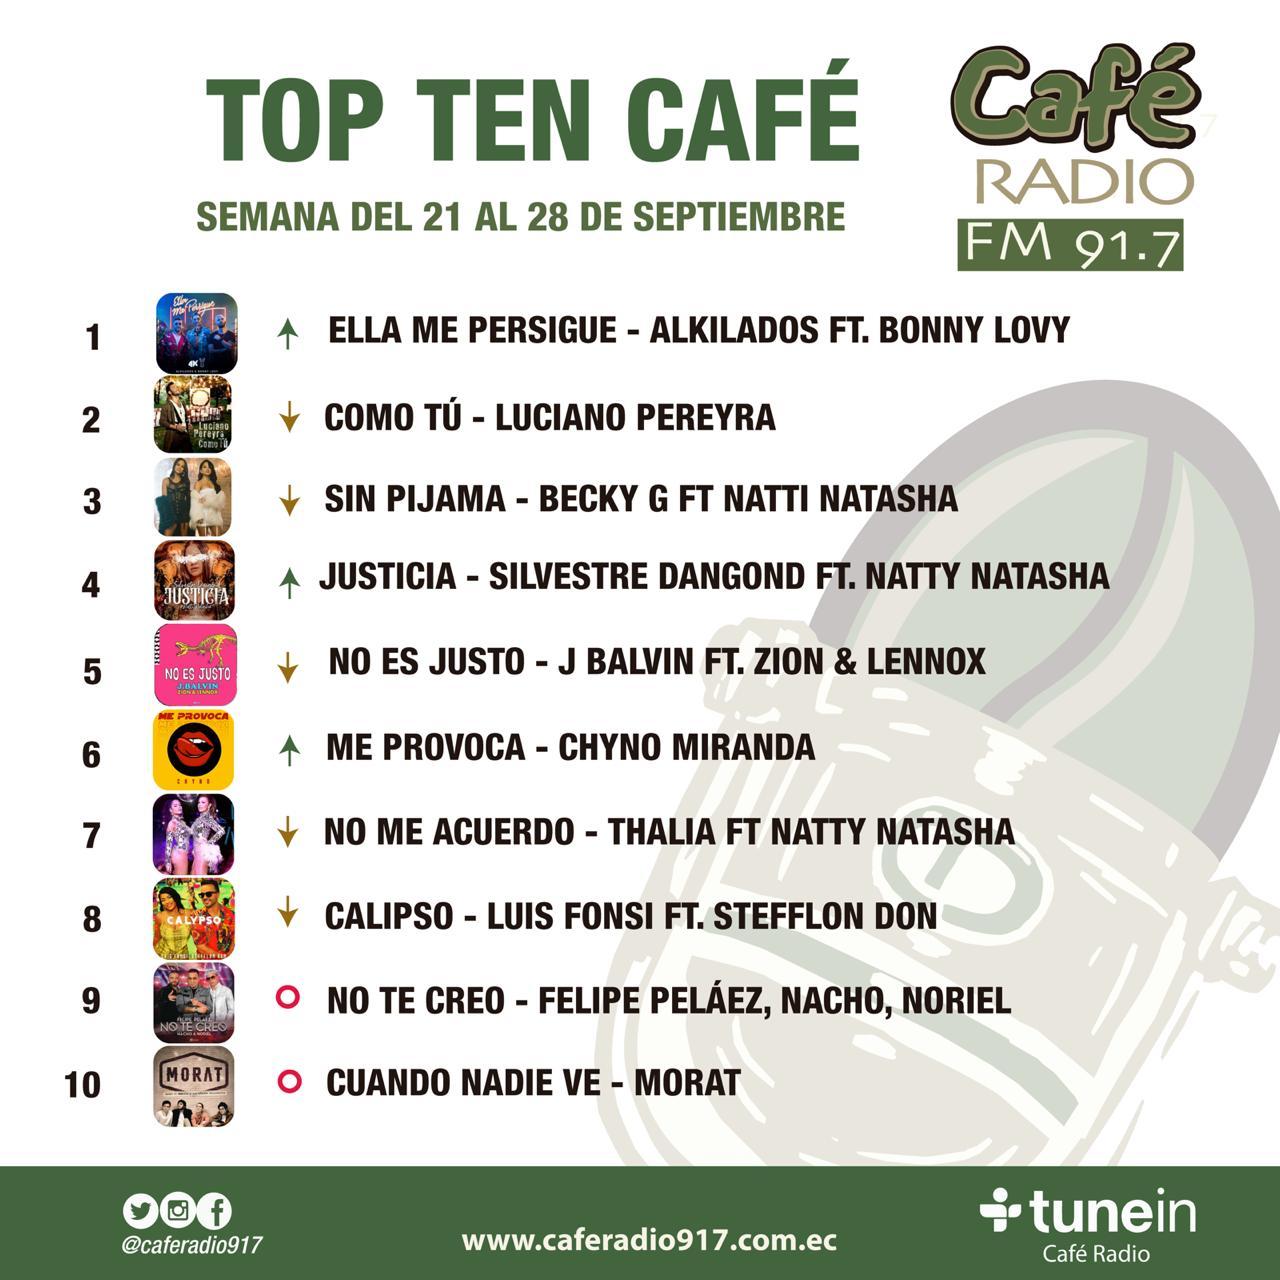 Top 10 Café: Semana del 21 al 28 de septiembre